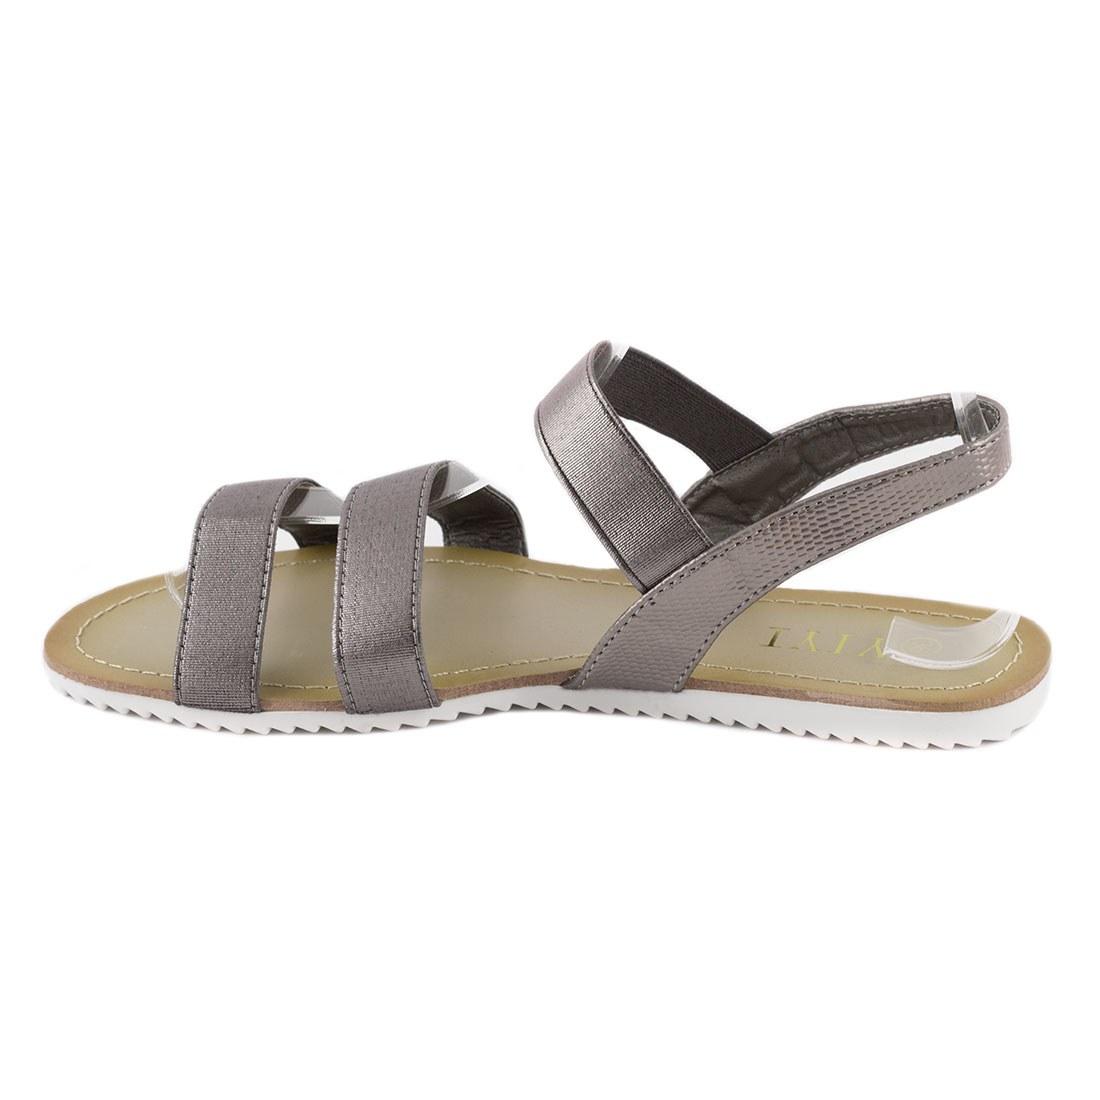 Sandale dama cu talpa joasa K-58-GRI